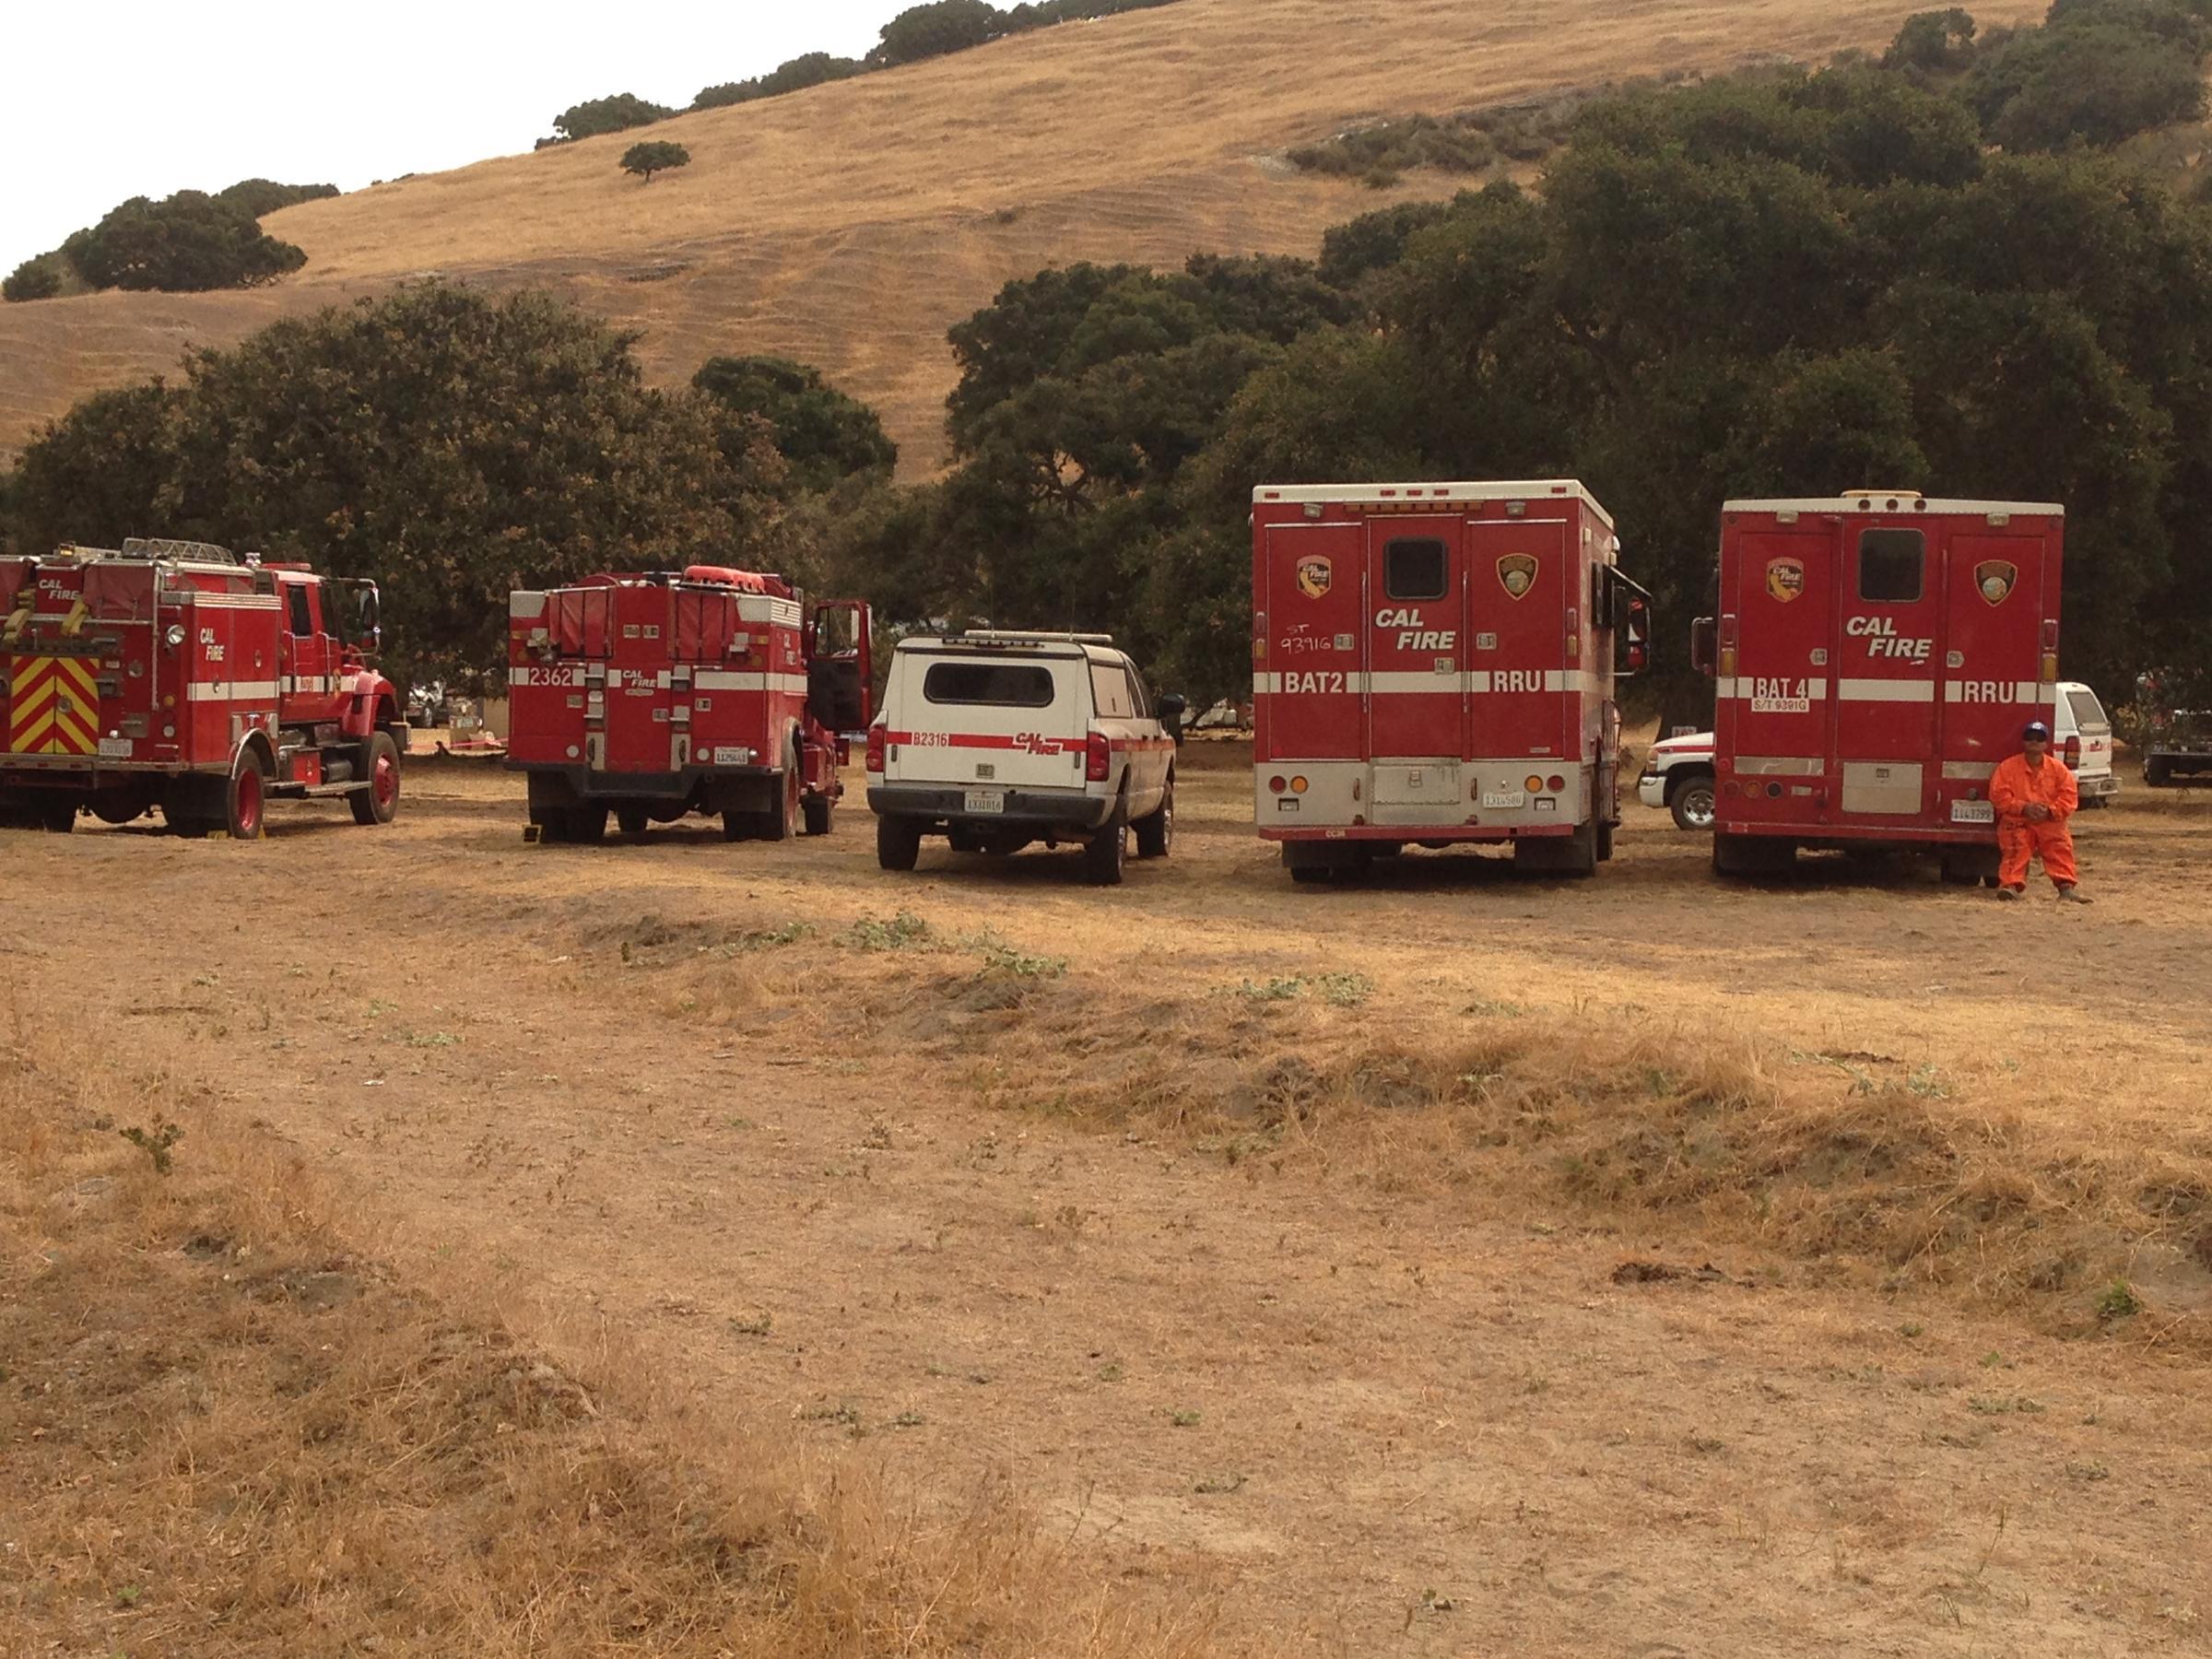 Soberanes Fire Bulldozer Operator Killed Overnight